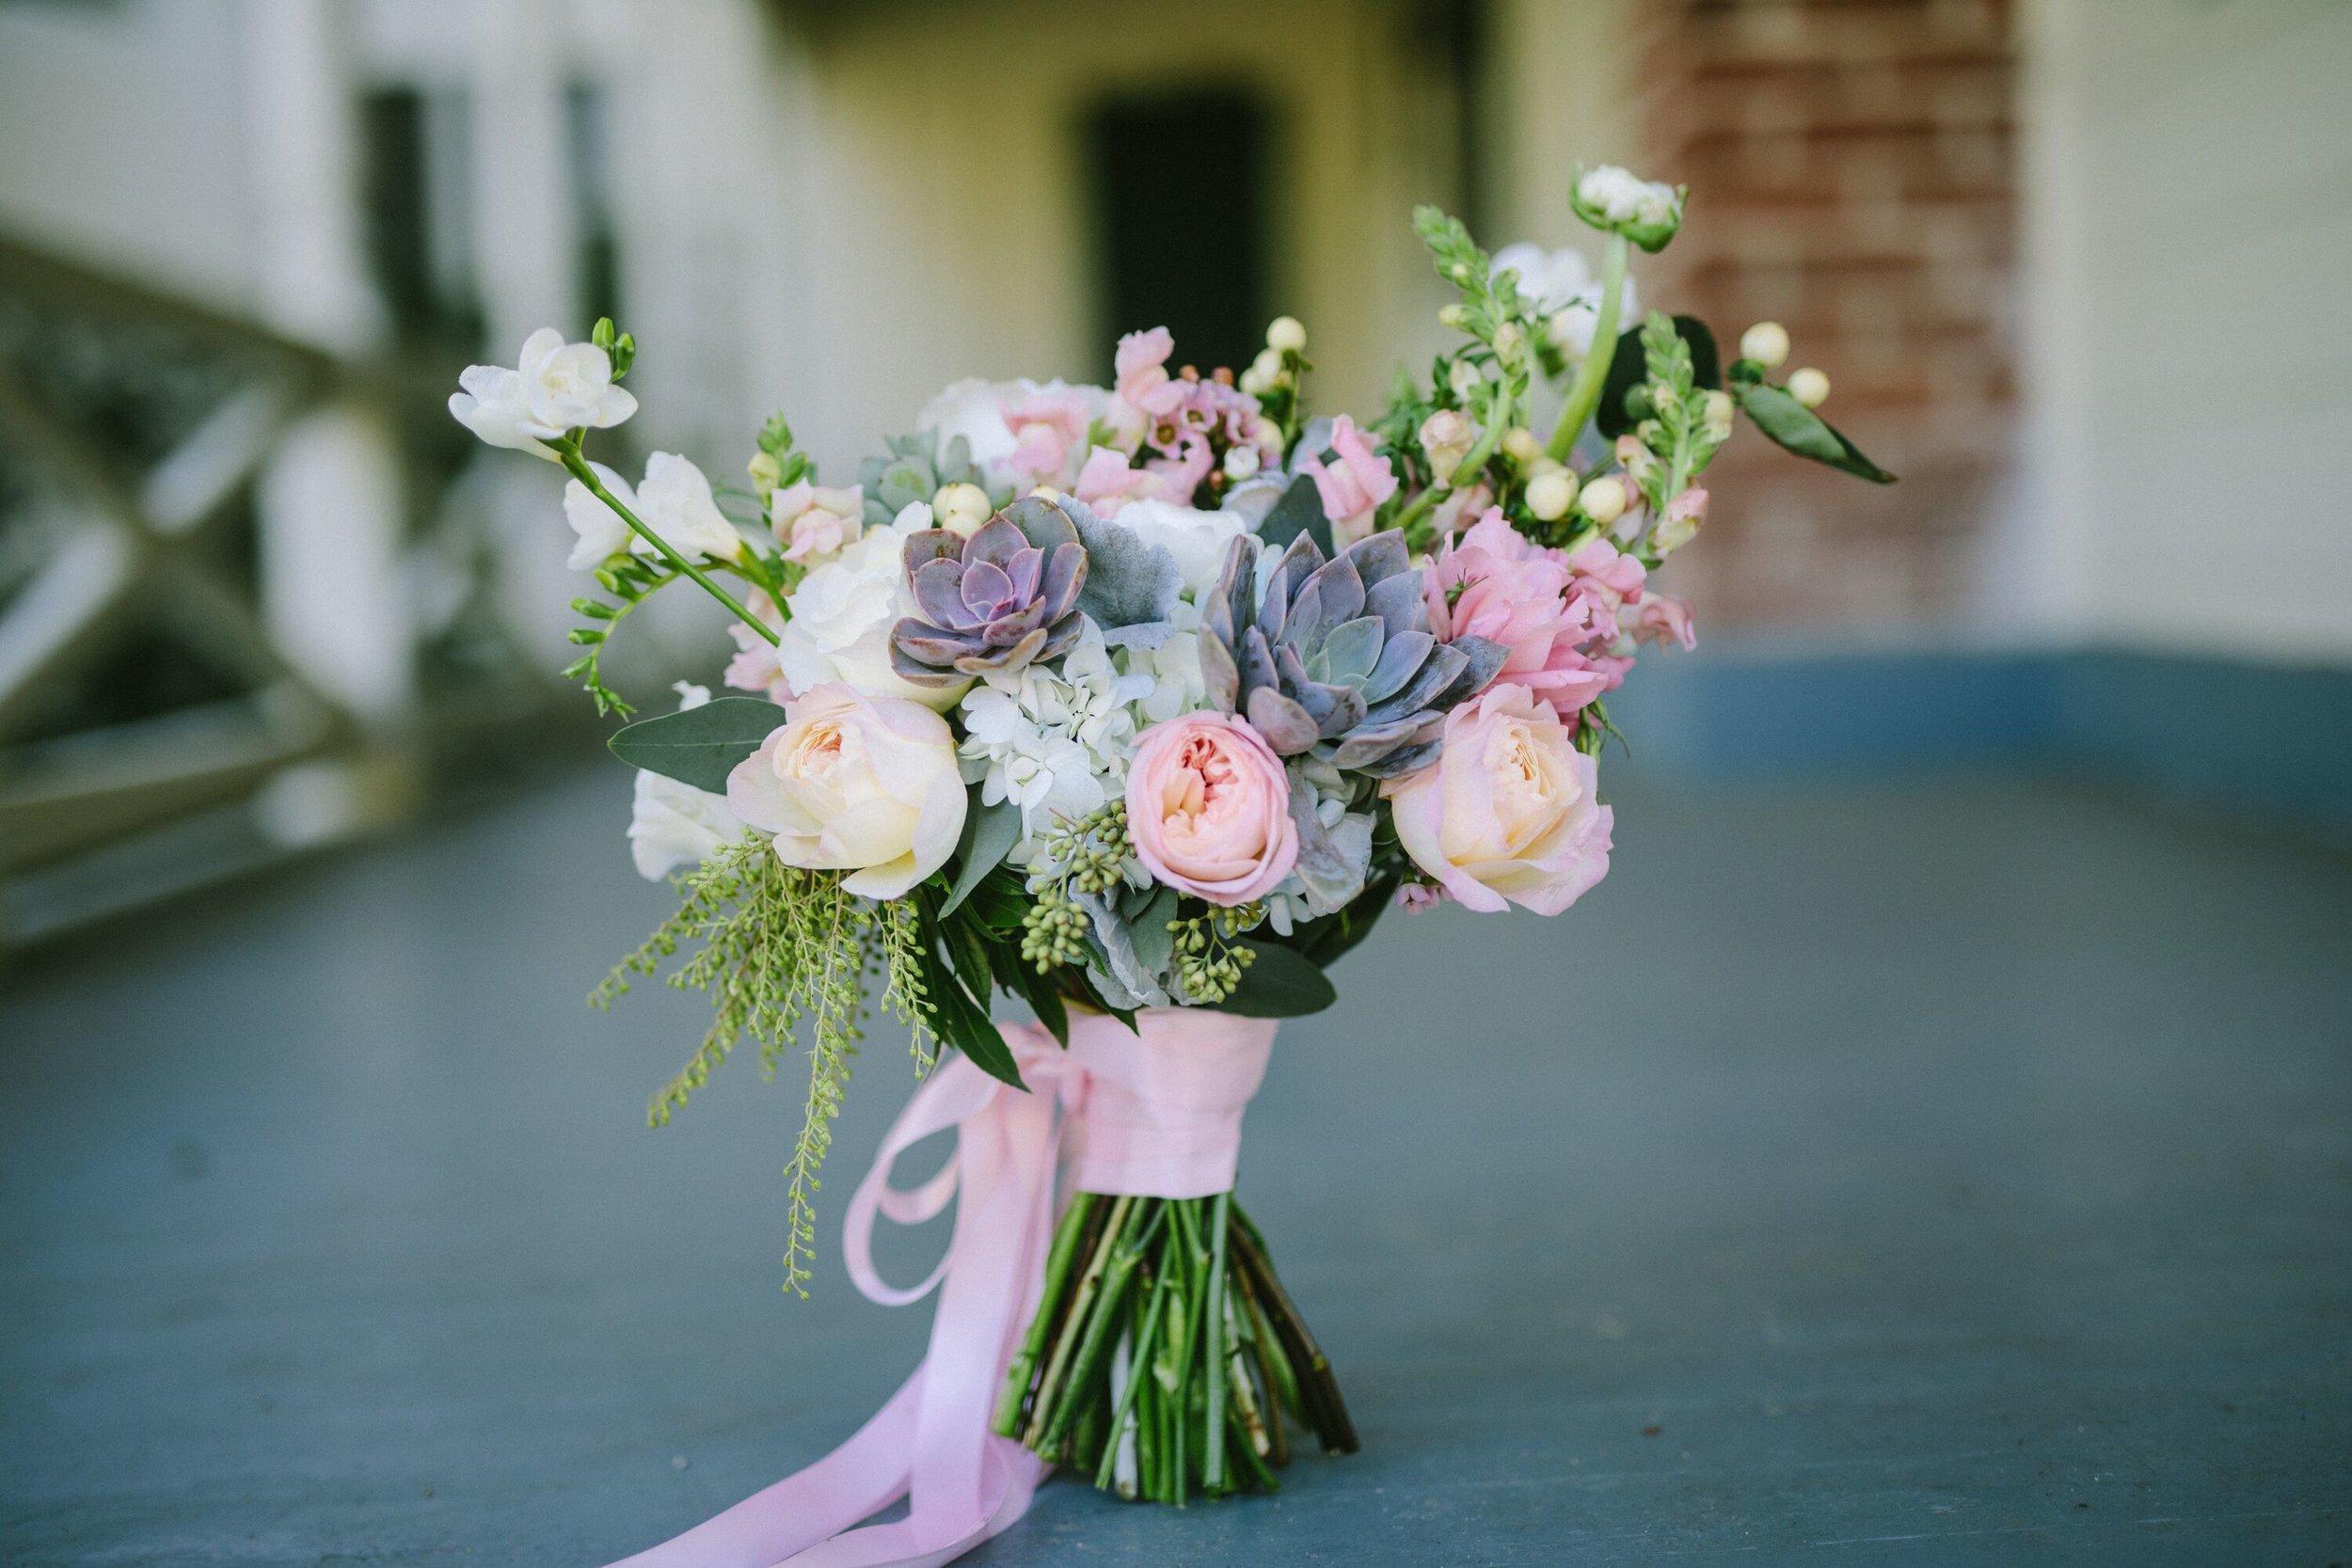 www.santabarbarawedding.com | Photographer: Patrick Ang | Venue: Rancho La Patera & Stow House | Wedding Planner: Elyse Rowen of Elyse Events | Bridal Bouquet